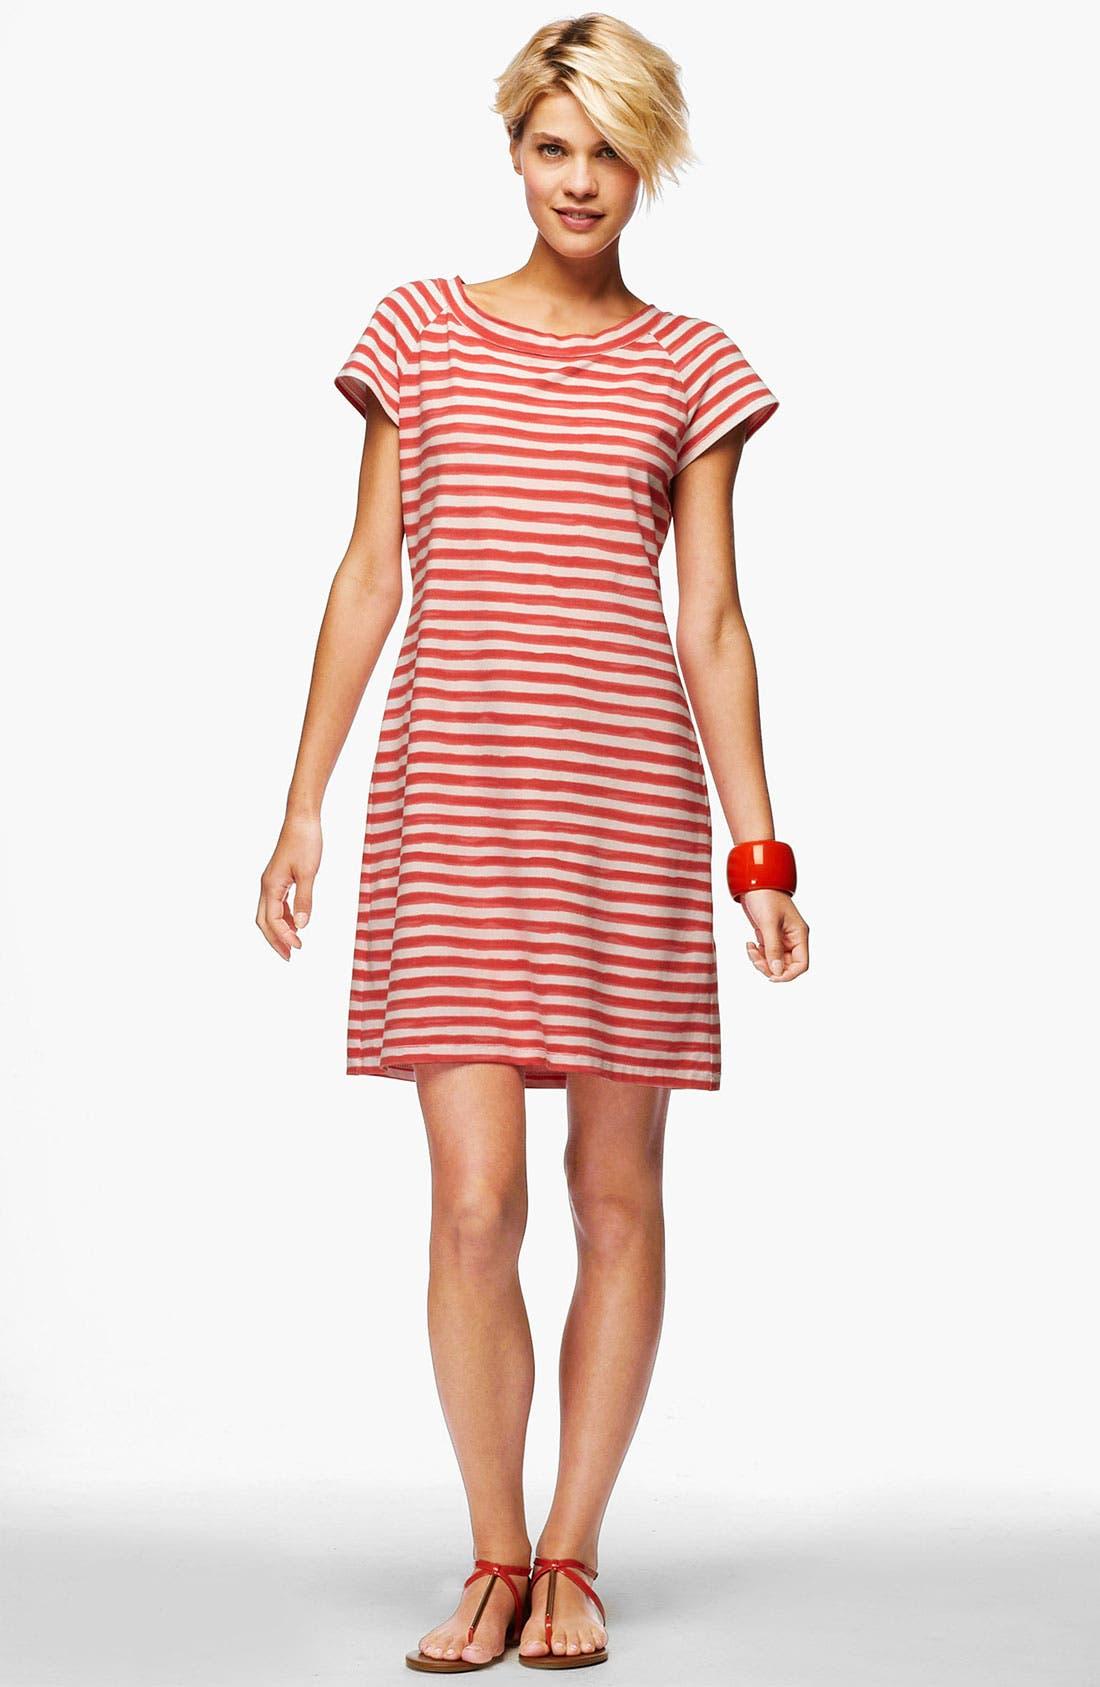 Alternate Image 1 Selected - Lafayette 148 New York Stripe Piqué Dress (Online Only)